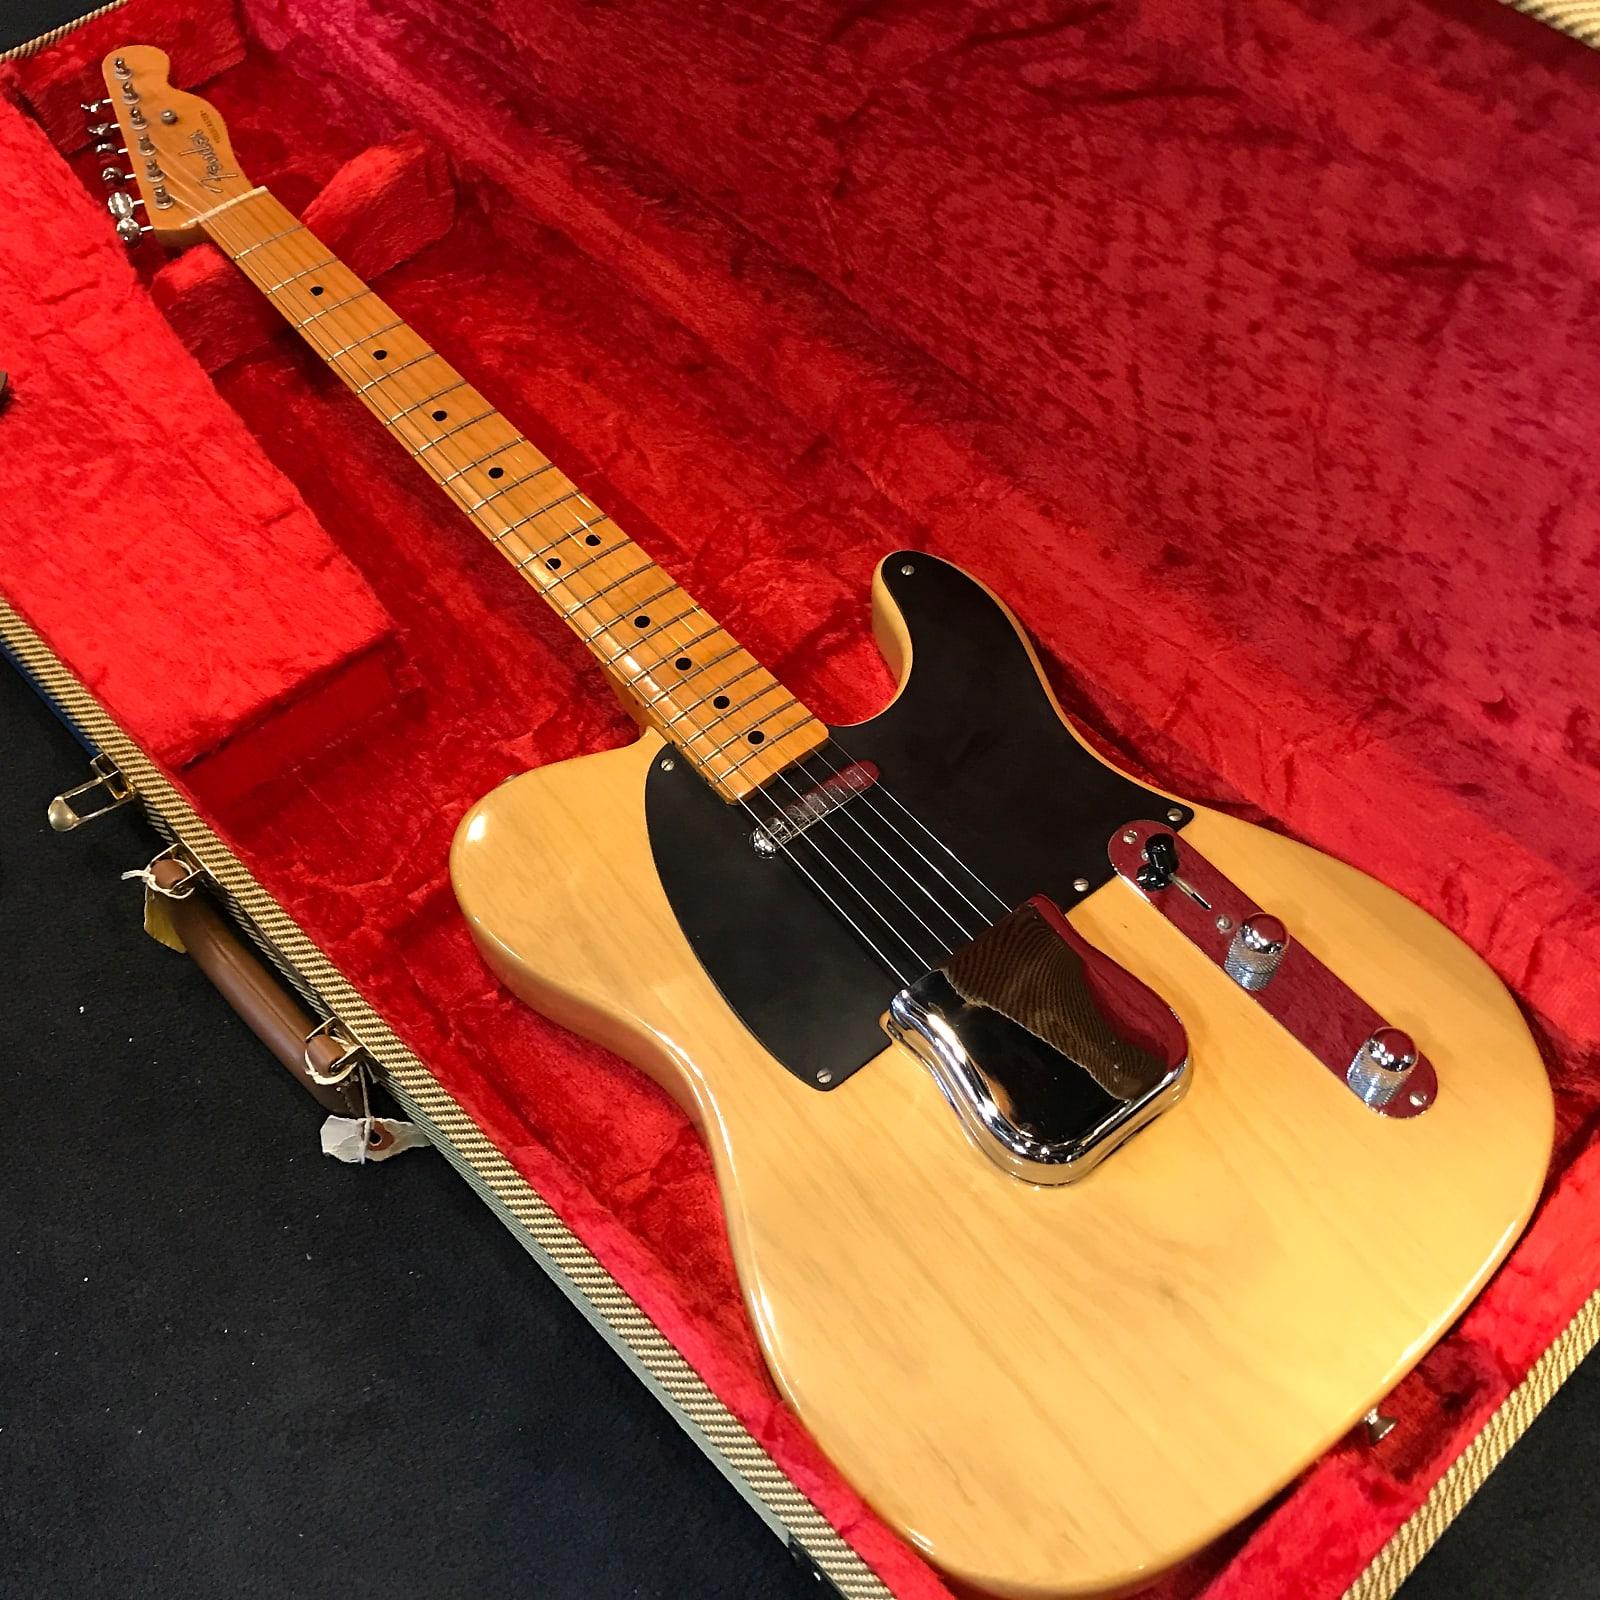 Fender American Vintage 1952 Reissue Telecaster Fullerton April 1982 w/ Case